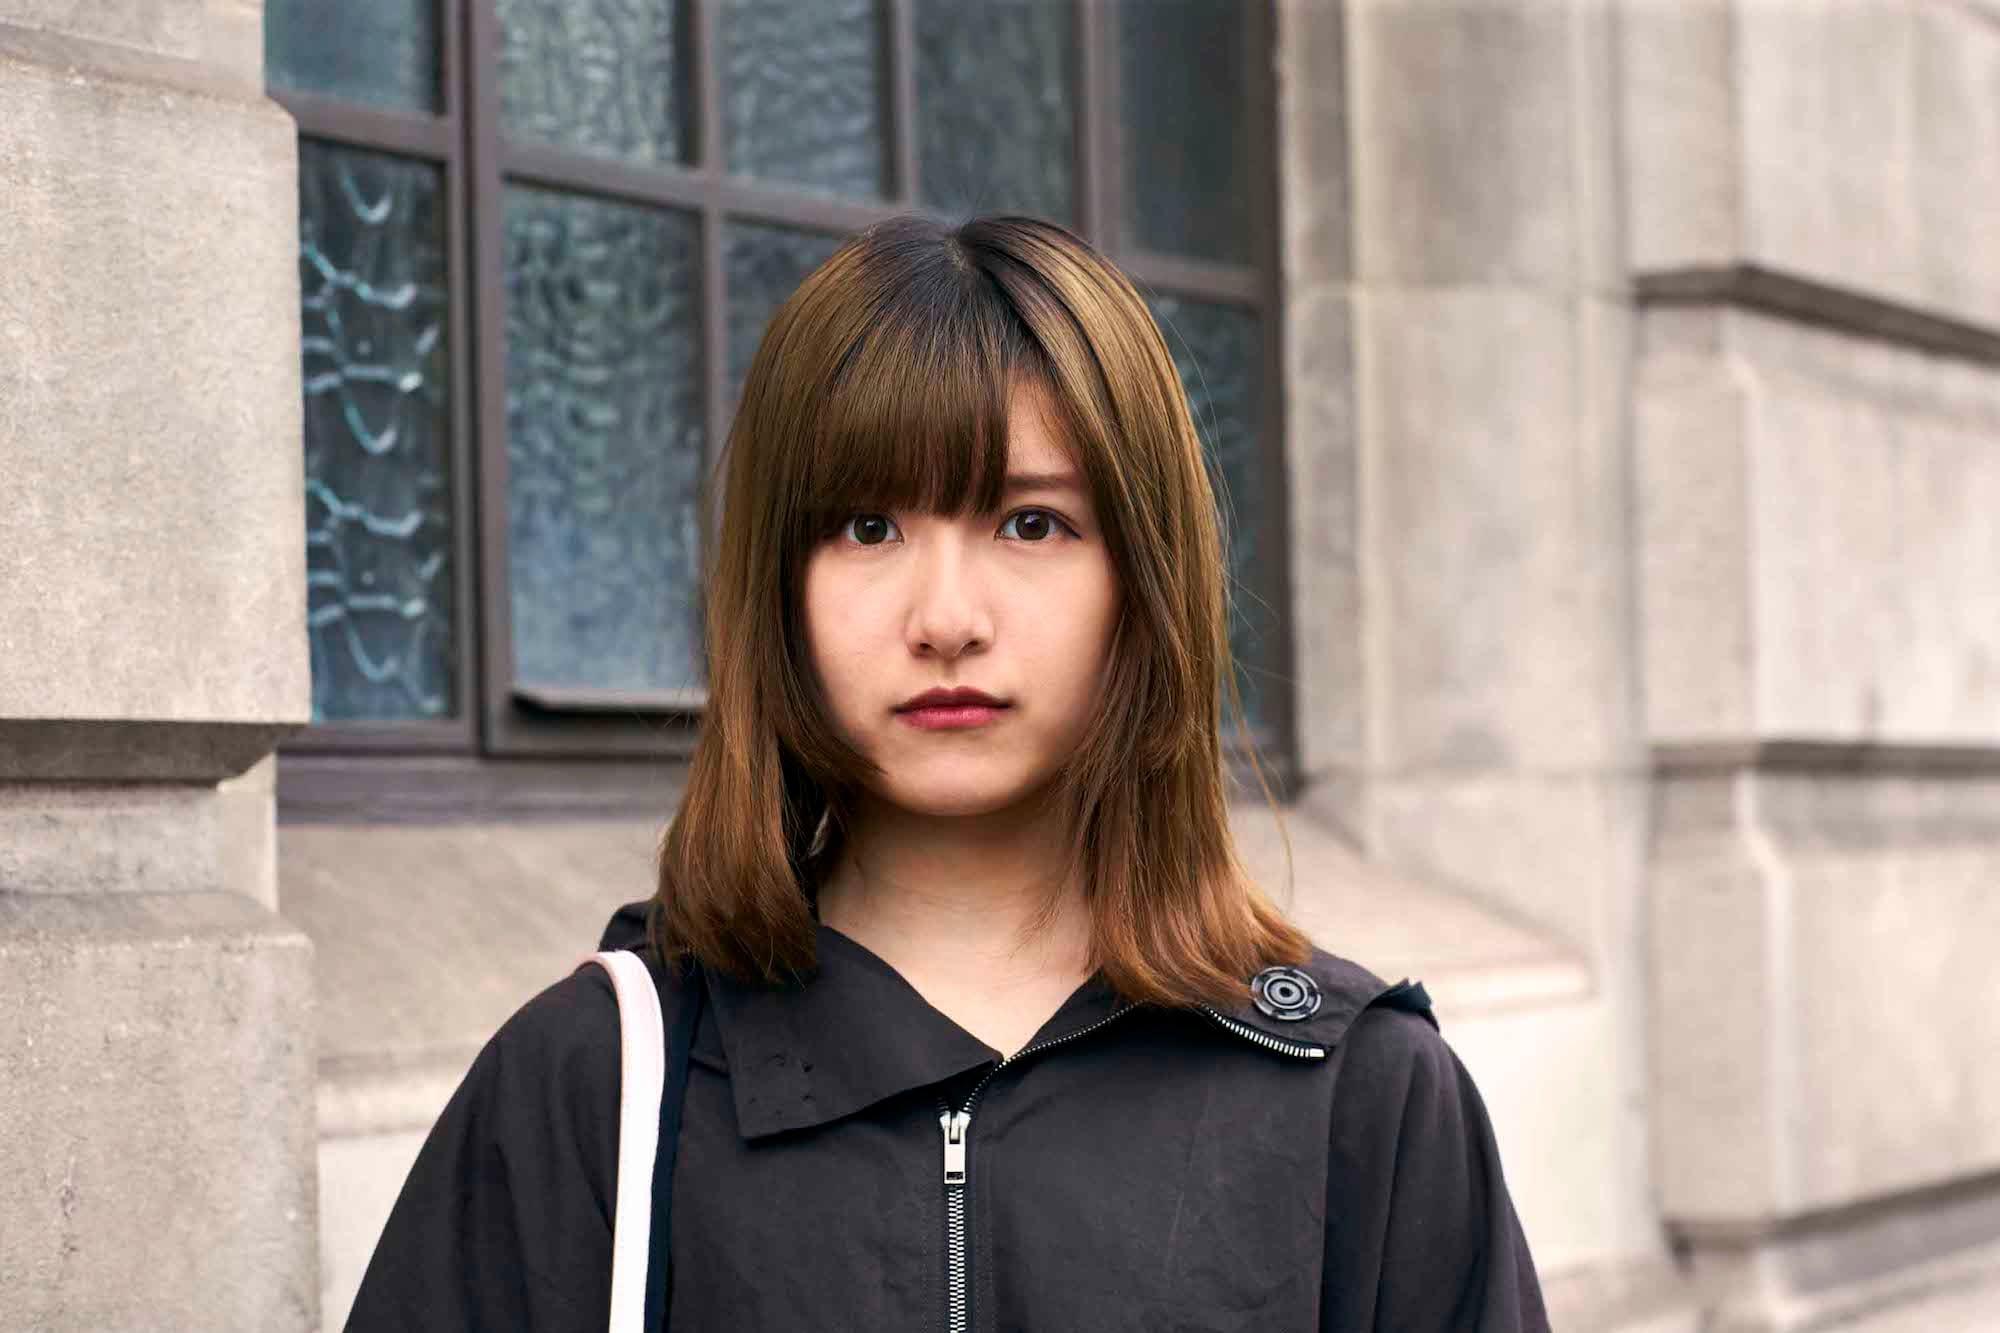 Wanita asia dengan model rambut pendek untuk wajah bulat bob pendek berponi depan dengan layer